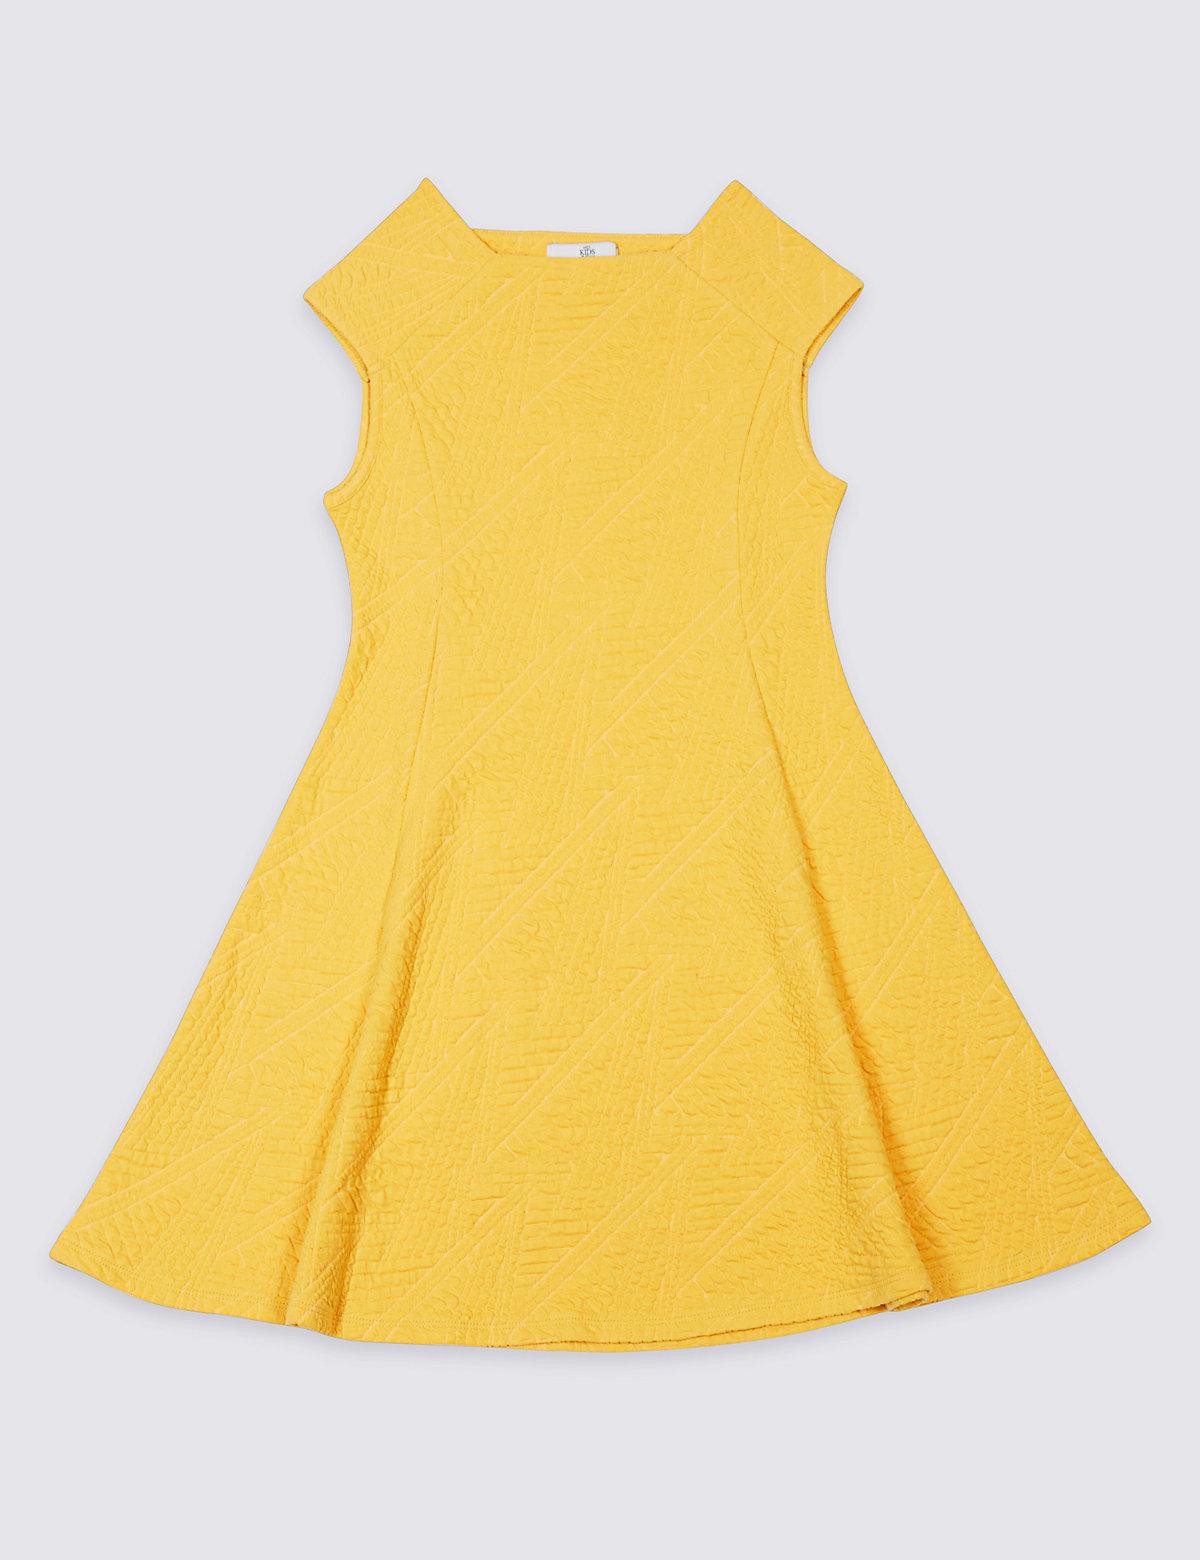 Textured Cotton Blend Dress (3-14 Years)